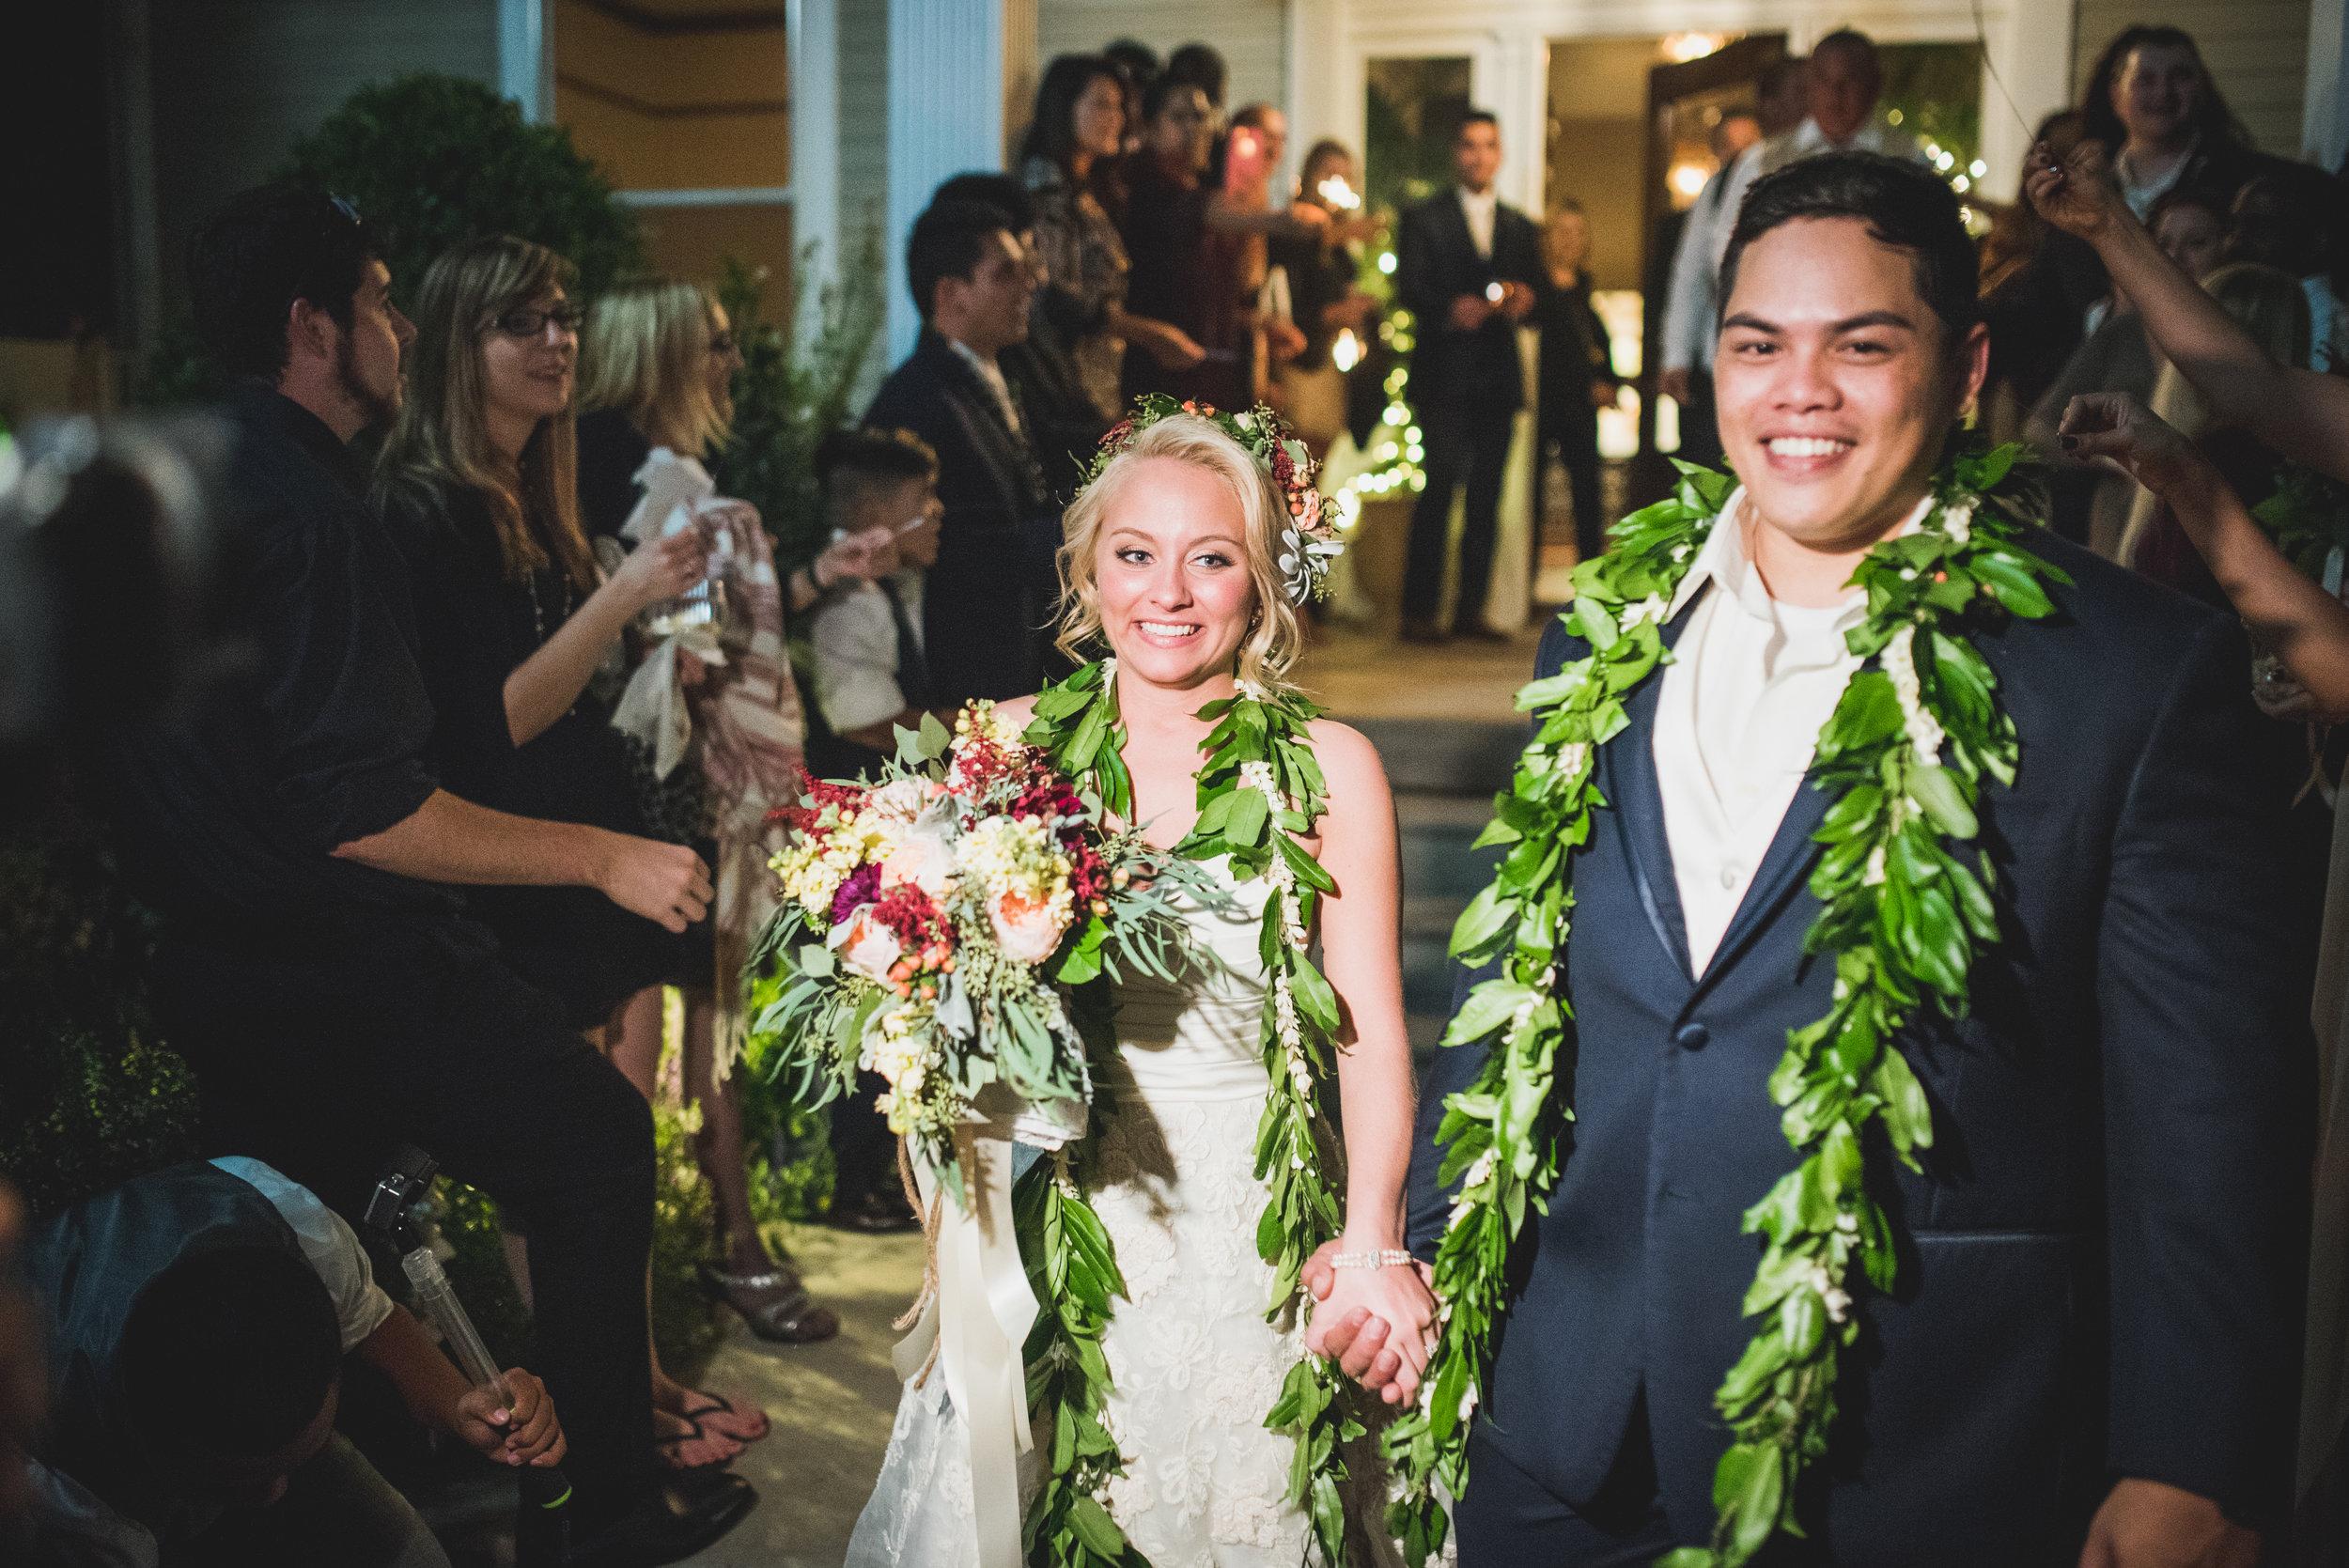 Nashville-wedding-photographers-CJ's-Off-The-Square-78.JPG